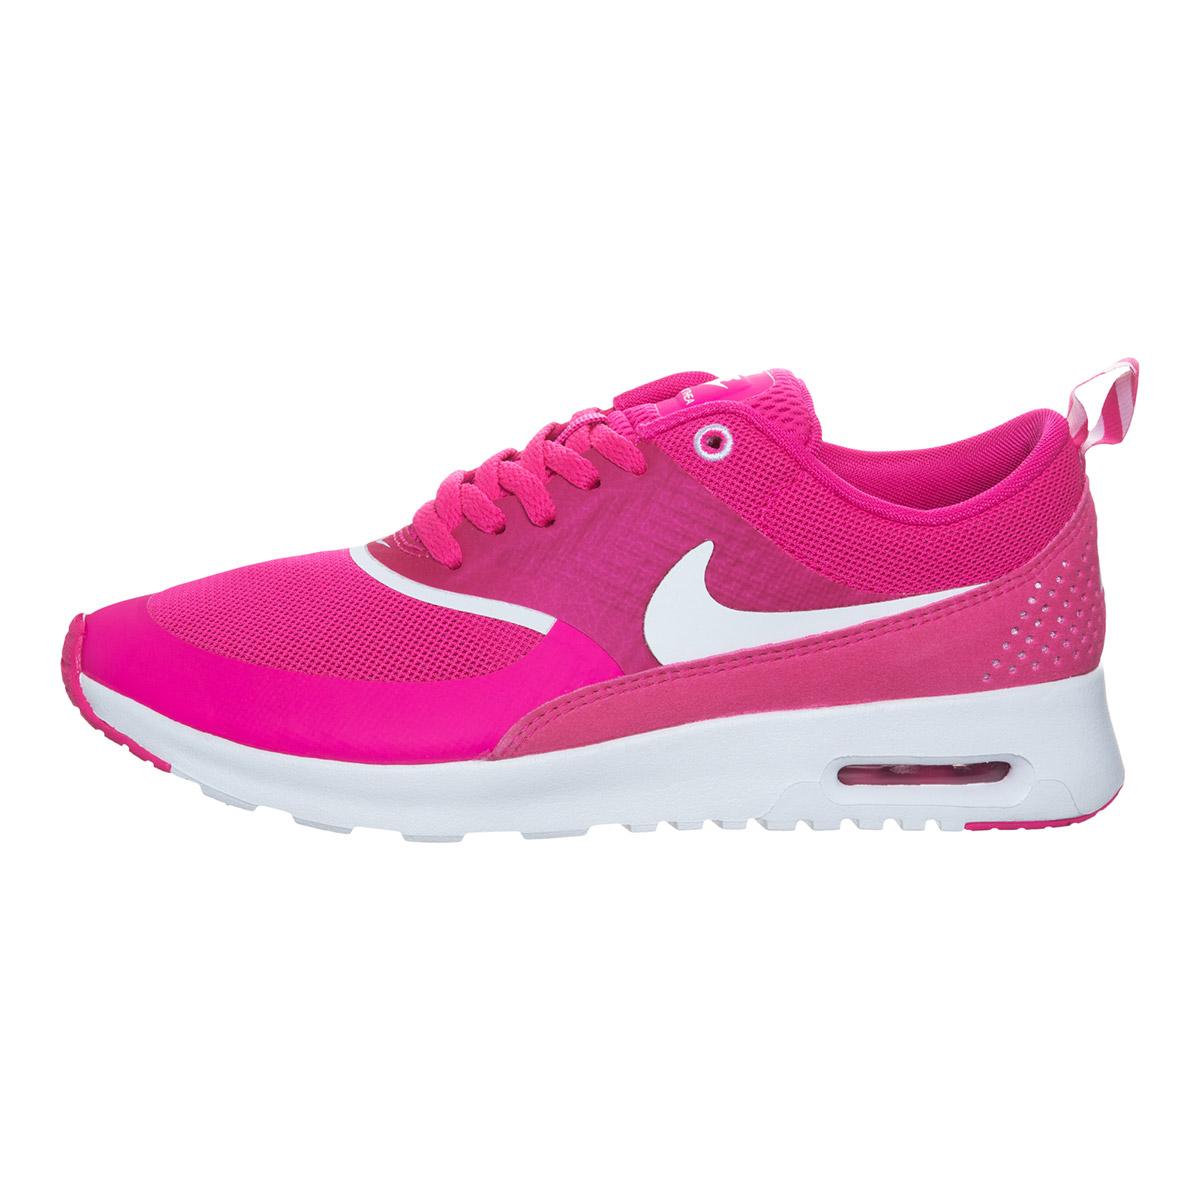 90 Mujer Fucsia zapatillas Nike Boedo Fucsia Vt Air Max 1x4AWgwqIa